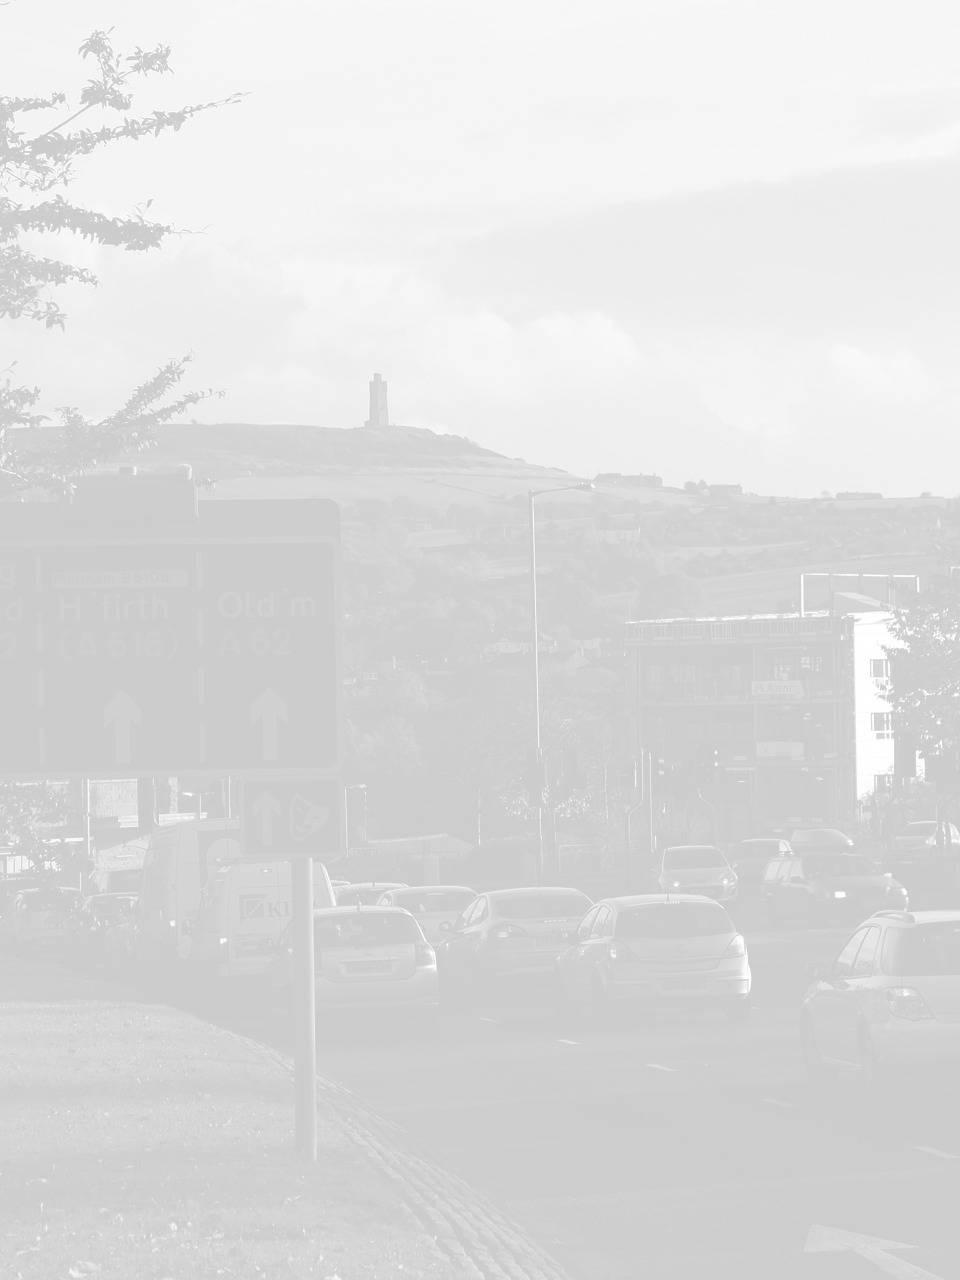 seo company in huddersfield image of huddersfield ring road